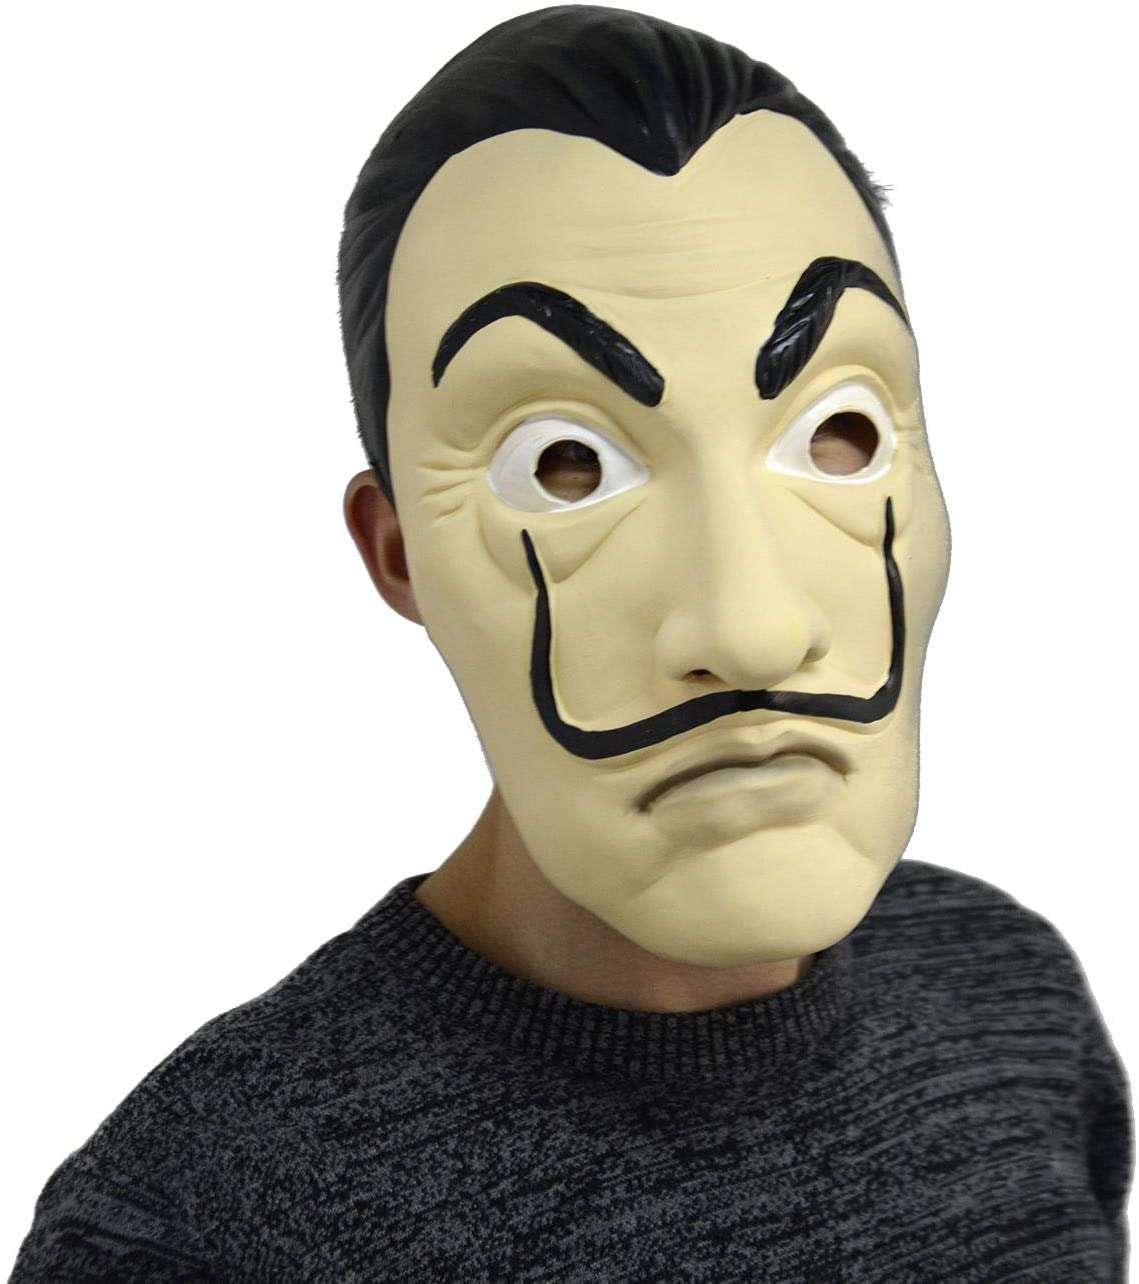 Leegicst Salvador Dali Maske Realistische Prop Gesichtsmaske Party Maske f/ür Halloween Festival,Party Maske f/ür Halloween Tanzparty Maske-A